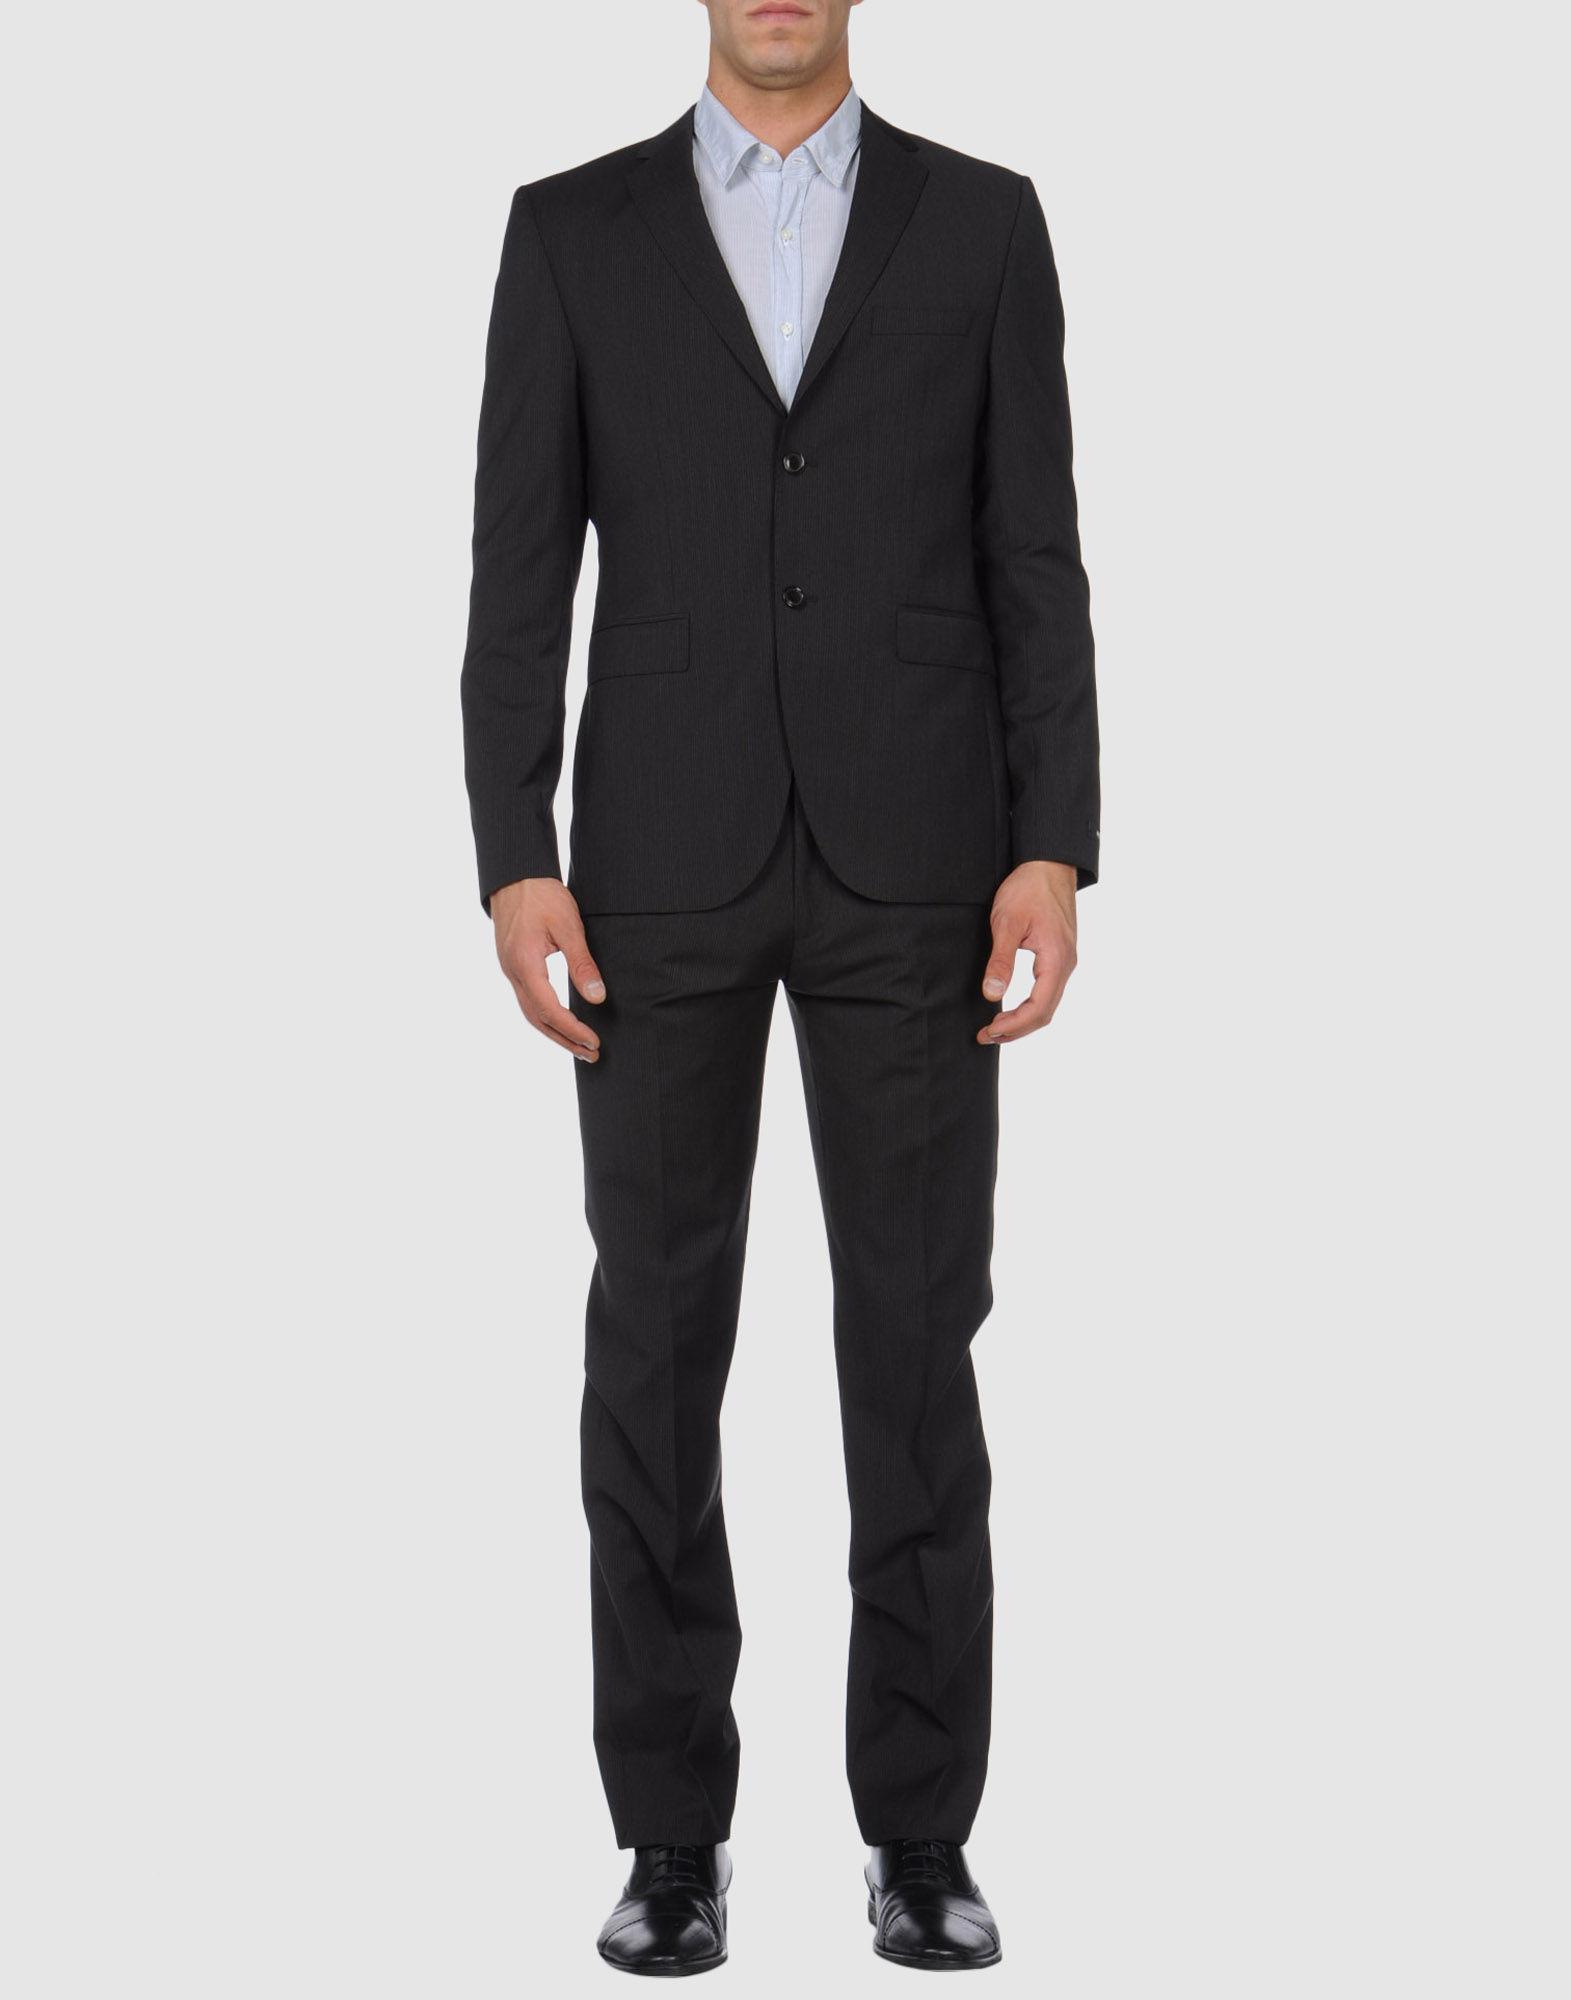 boss by hugo boss boss hugo boss suits in gray for men. Black Bedroom Furniture Sets. Home Design Ideas